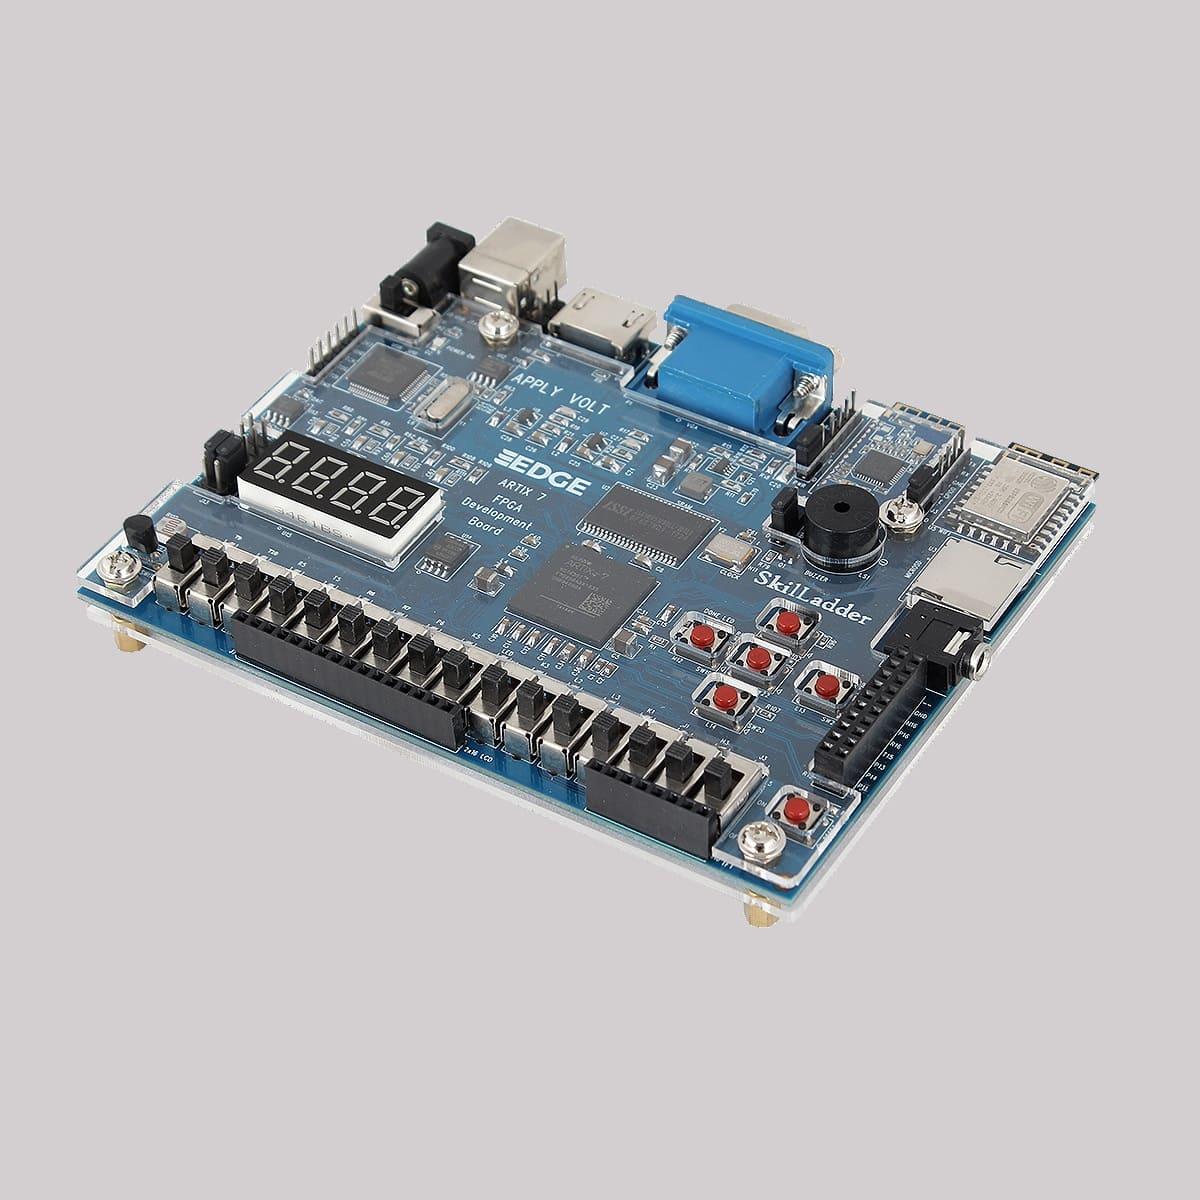 EDGE Artix 7 FPGA Development Board